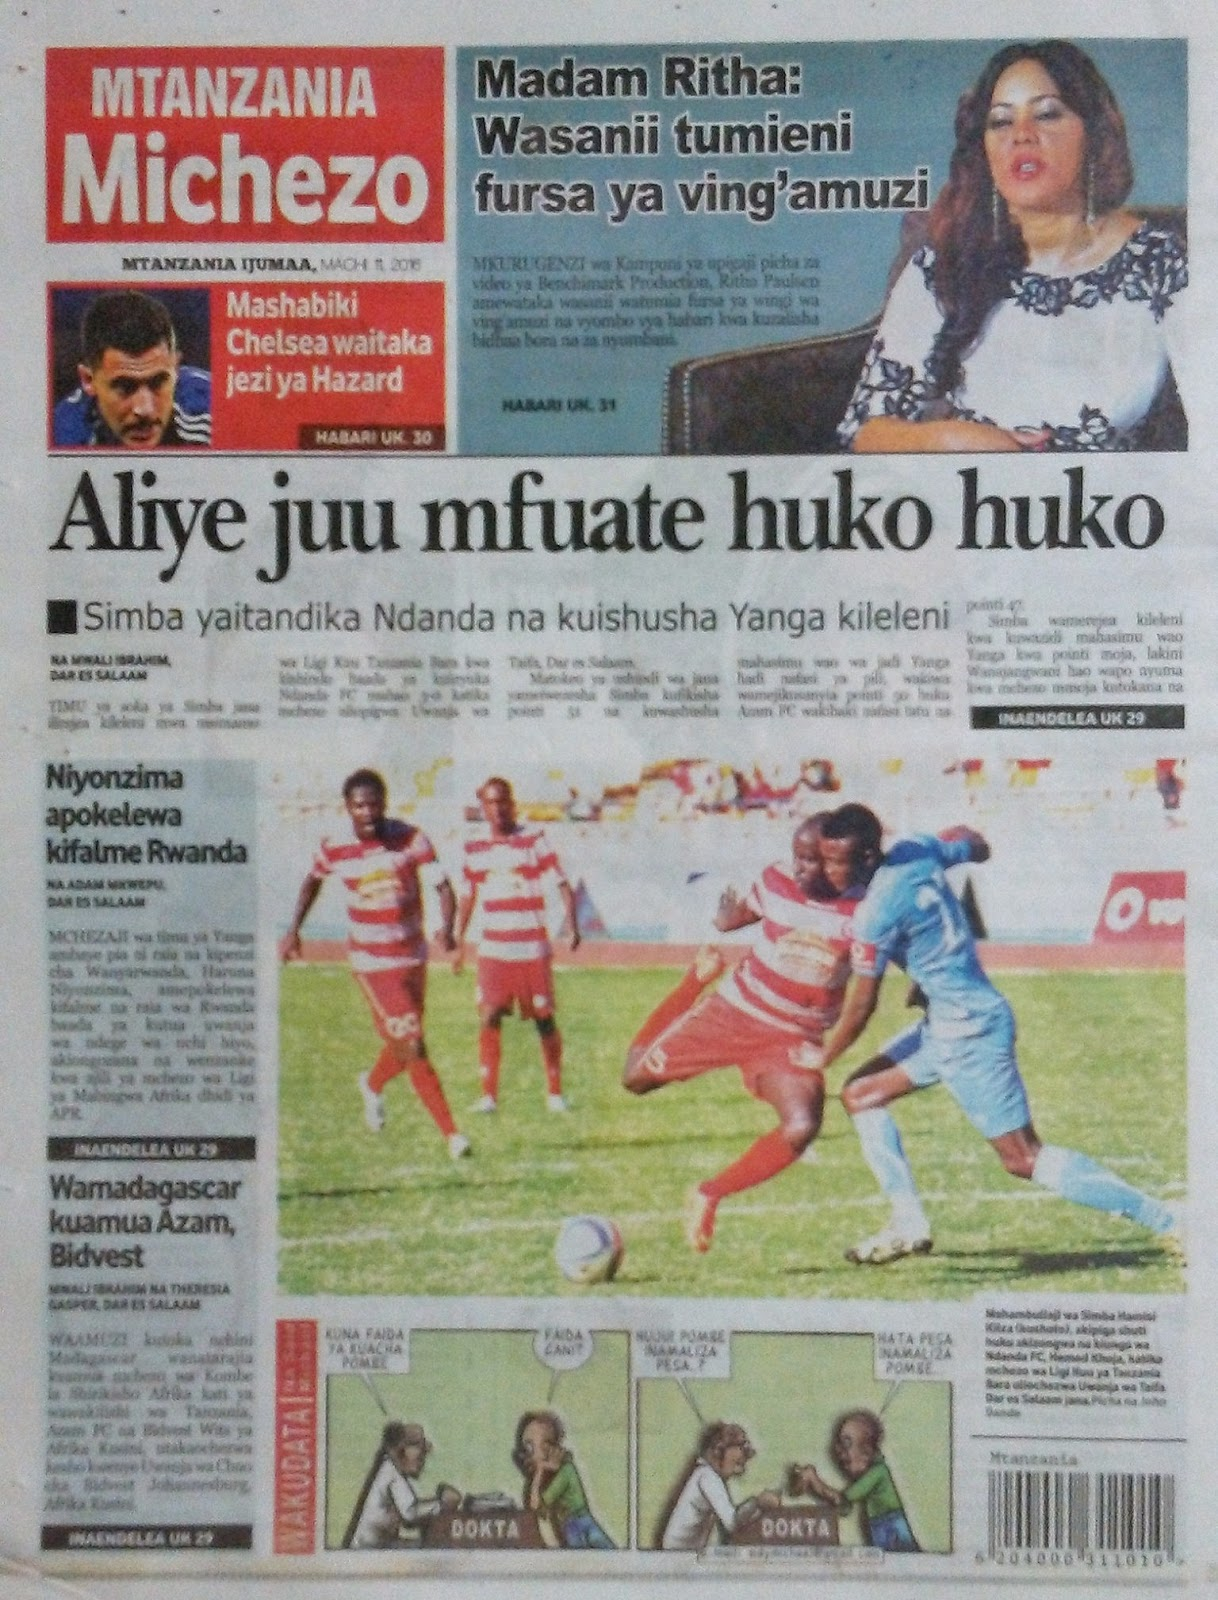 120 Chan Porn makubwa haya website entertinment celebrity news of tanzania